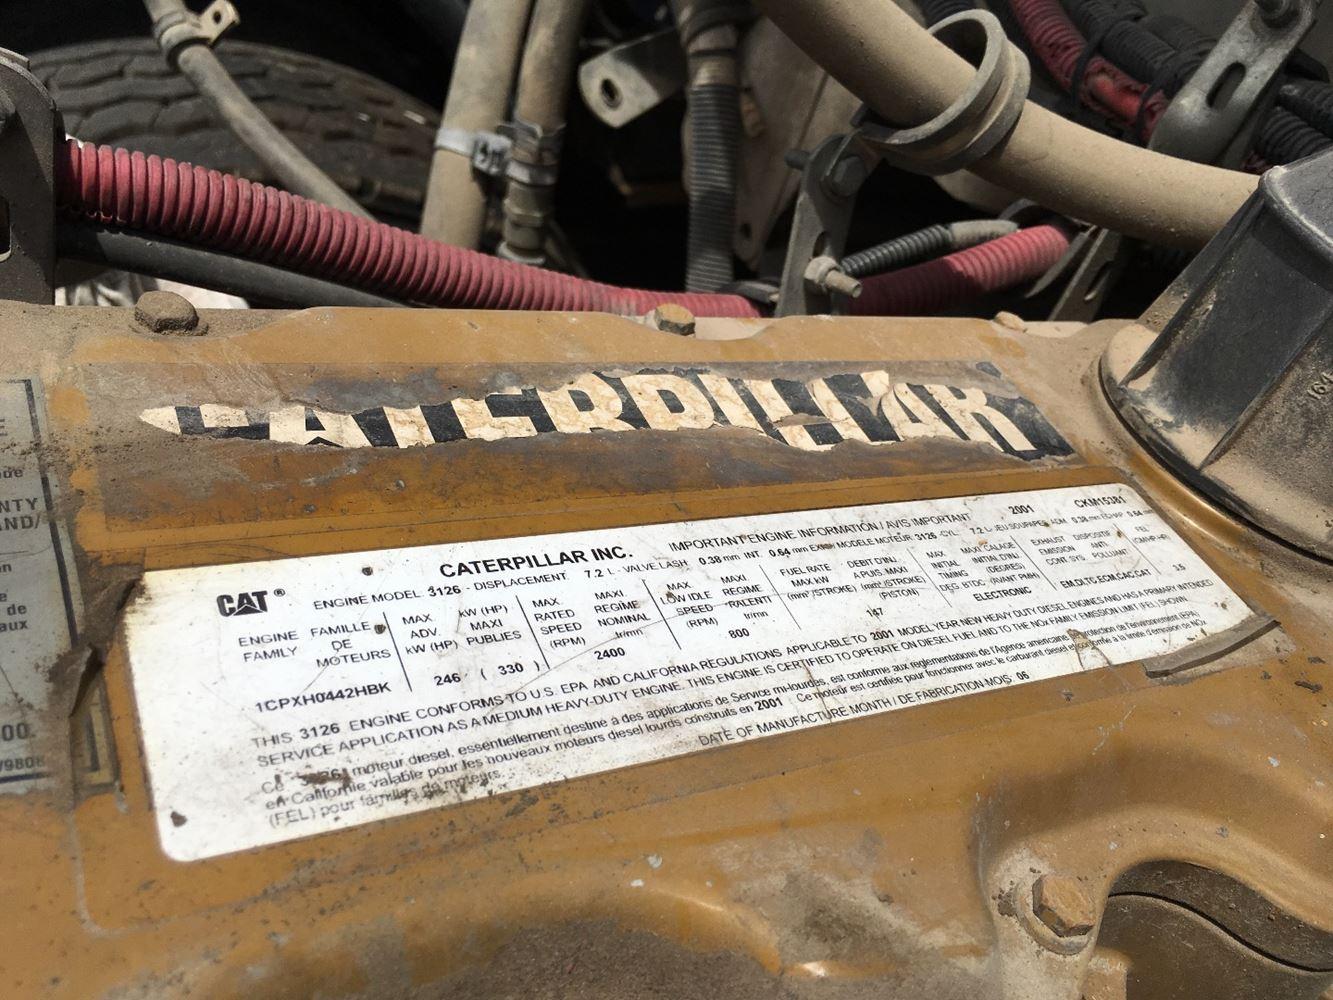 1999 Geo Tracker Engine Wiring Harness Worksheet And Diagram For 93 Caterpillar 246 Attachments Schematics Rh Caltech Ctp Com 1993 Chevy